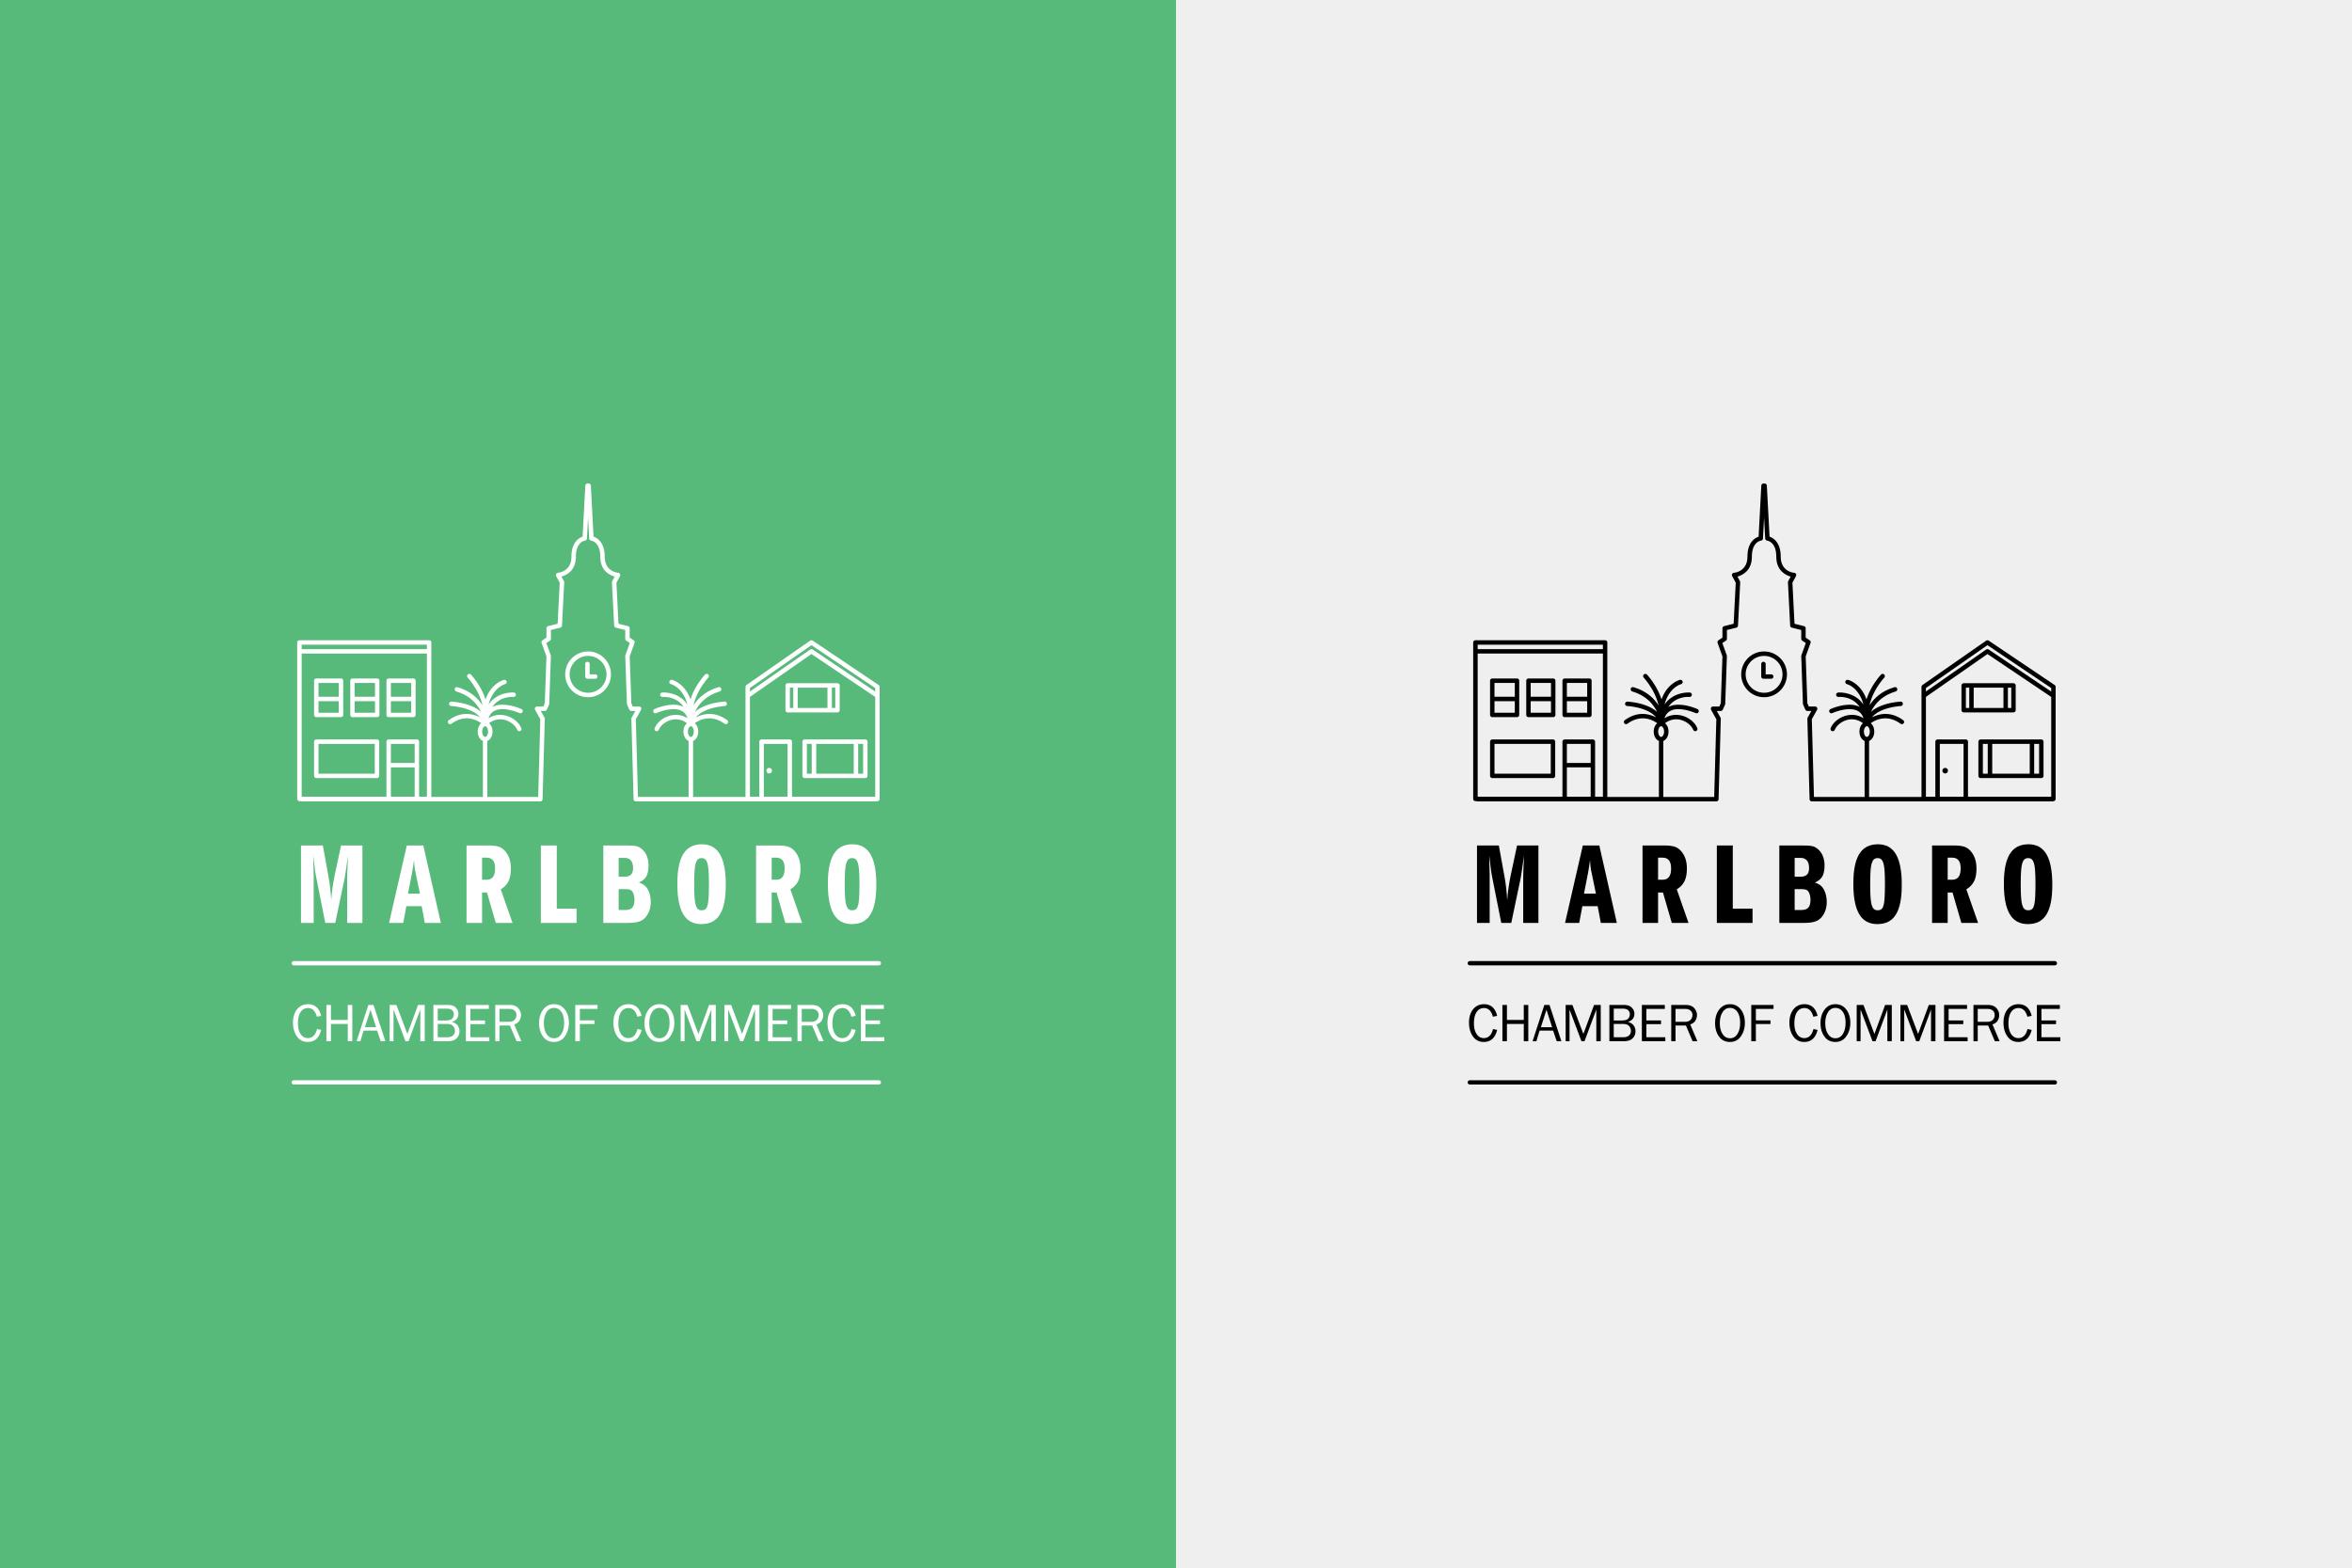 marlboro-logo-green.png